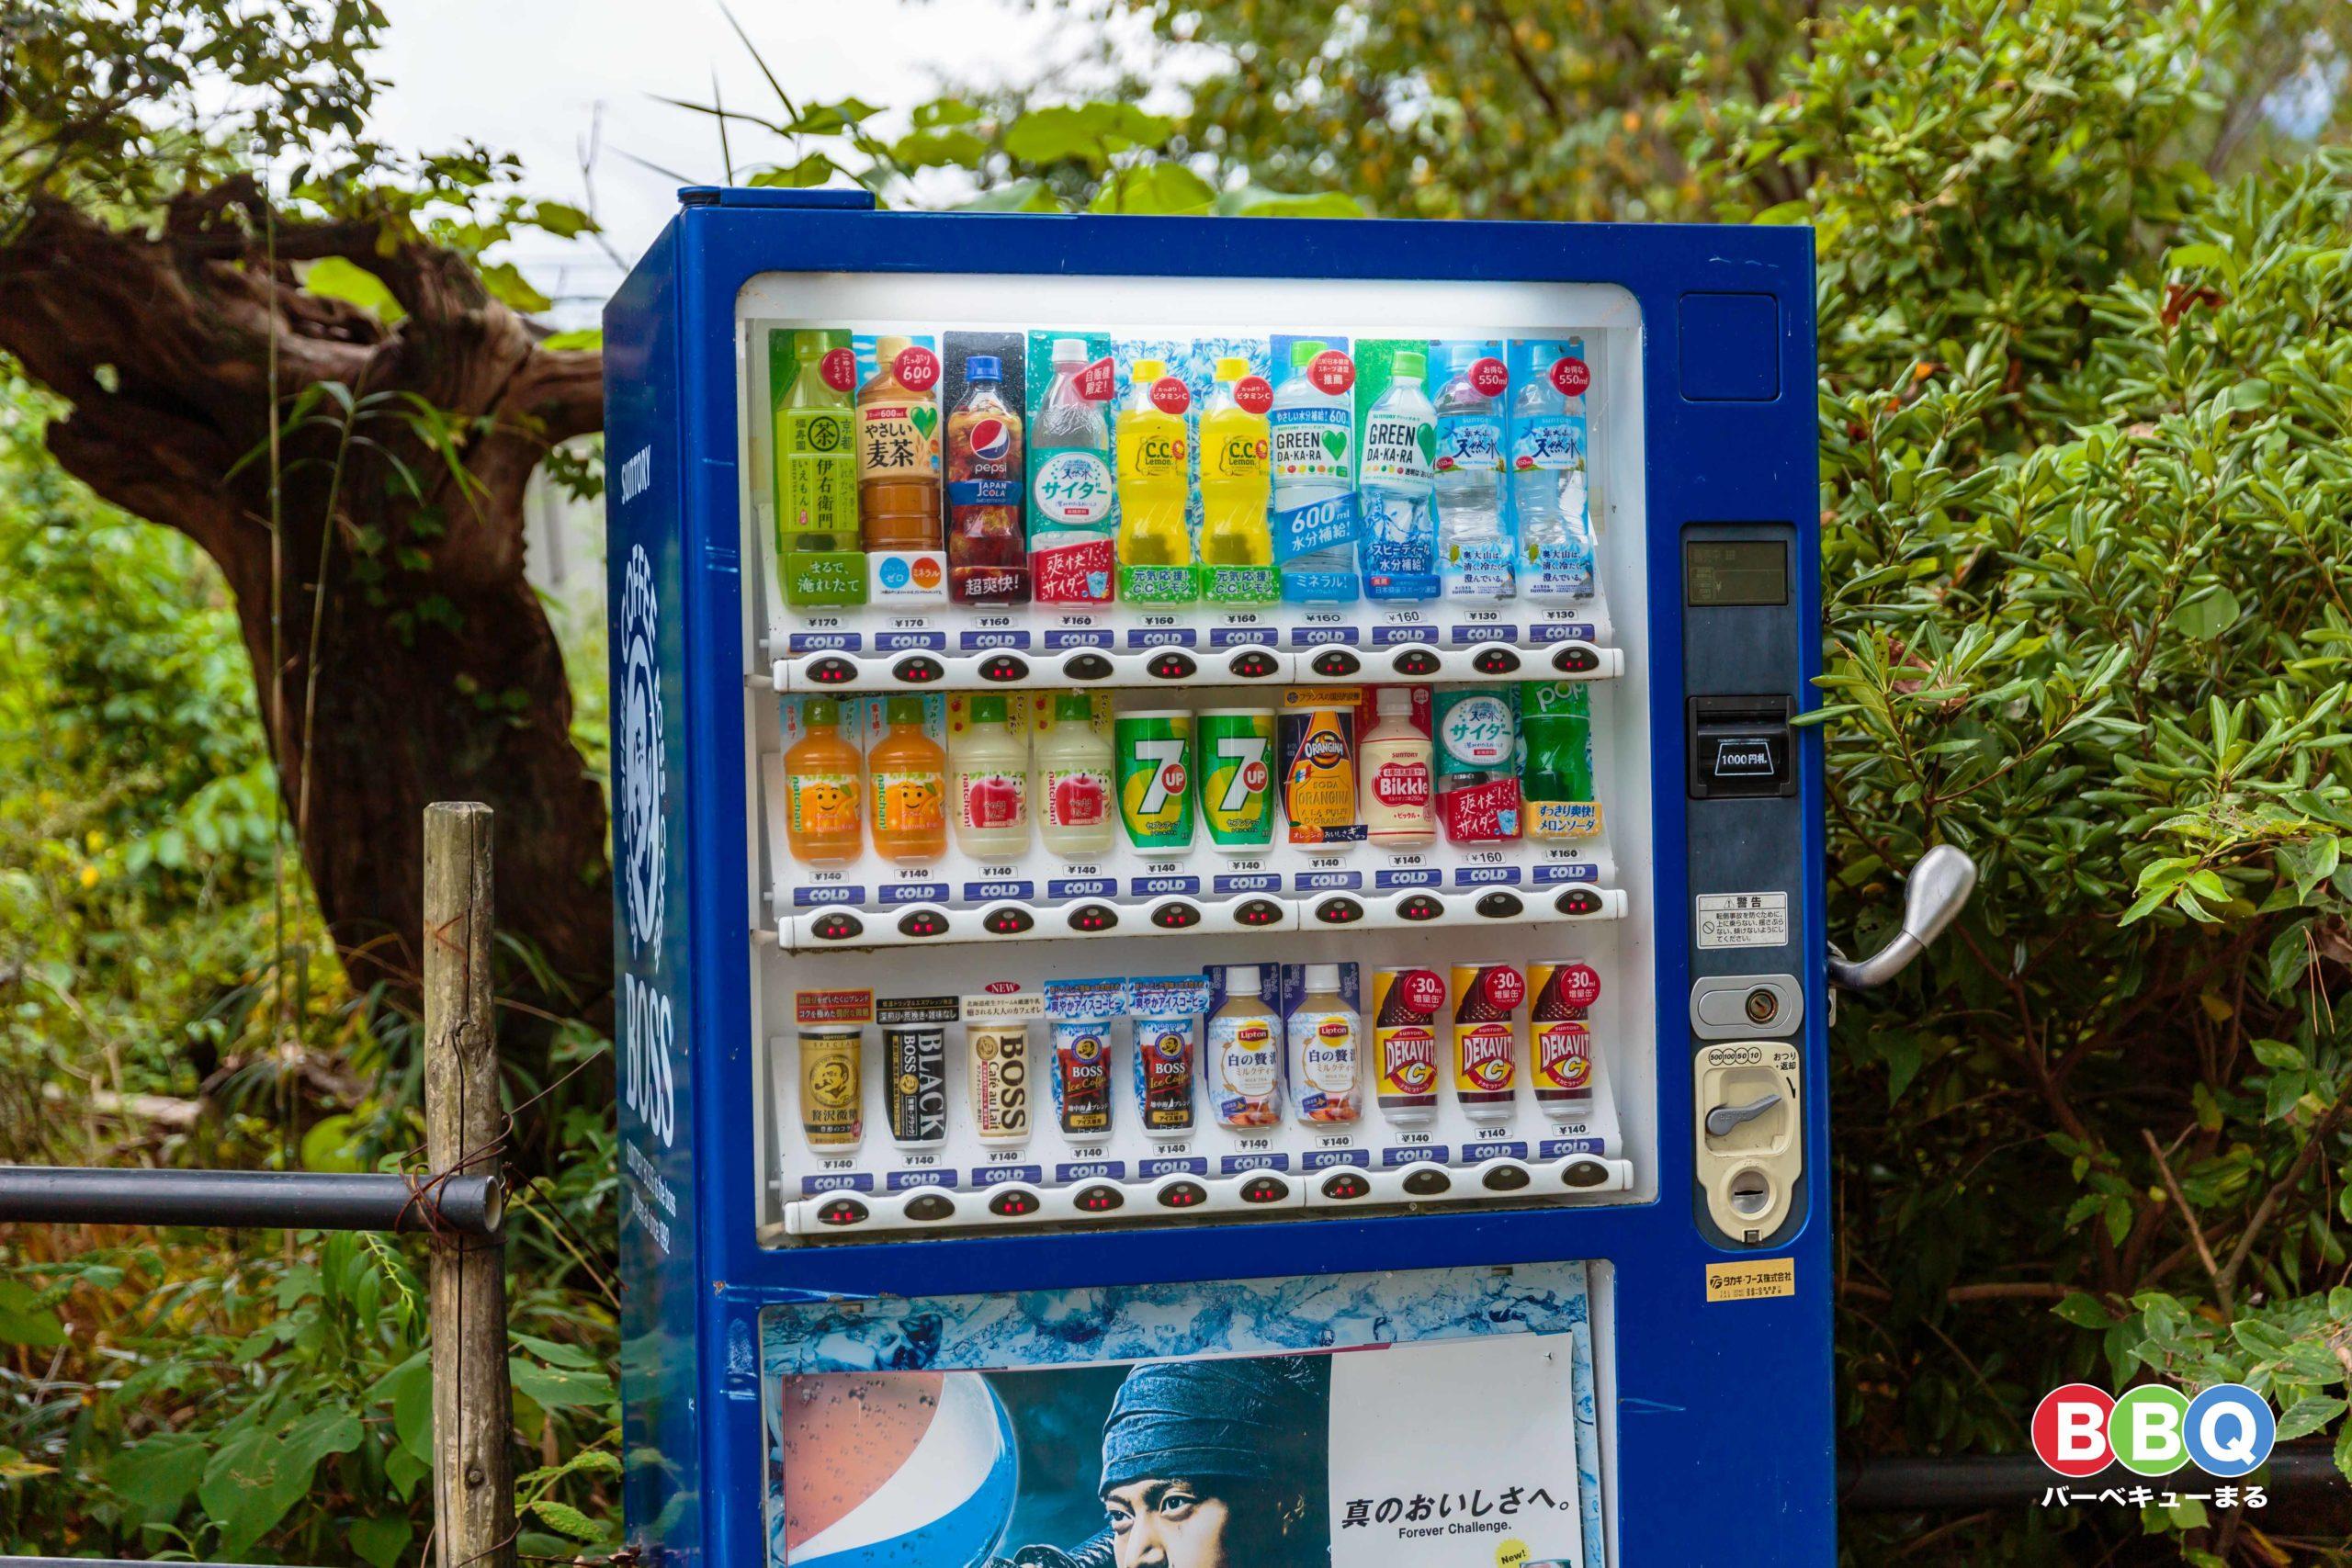 近江舞子中浜水泳場の自販機